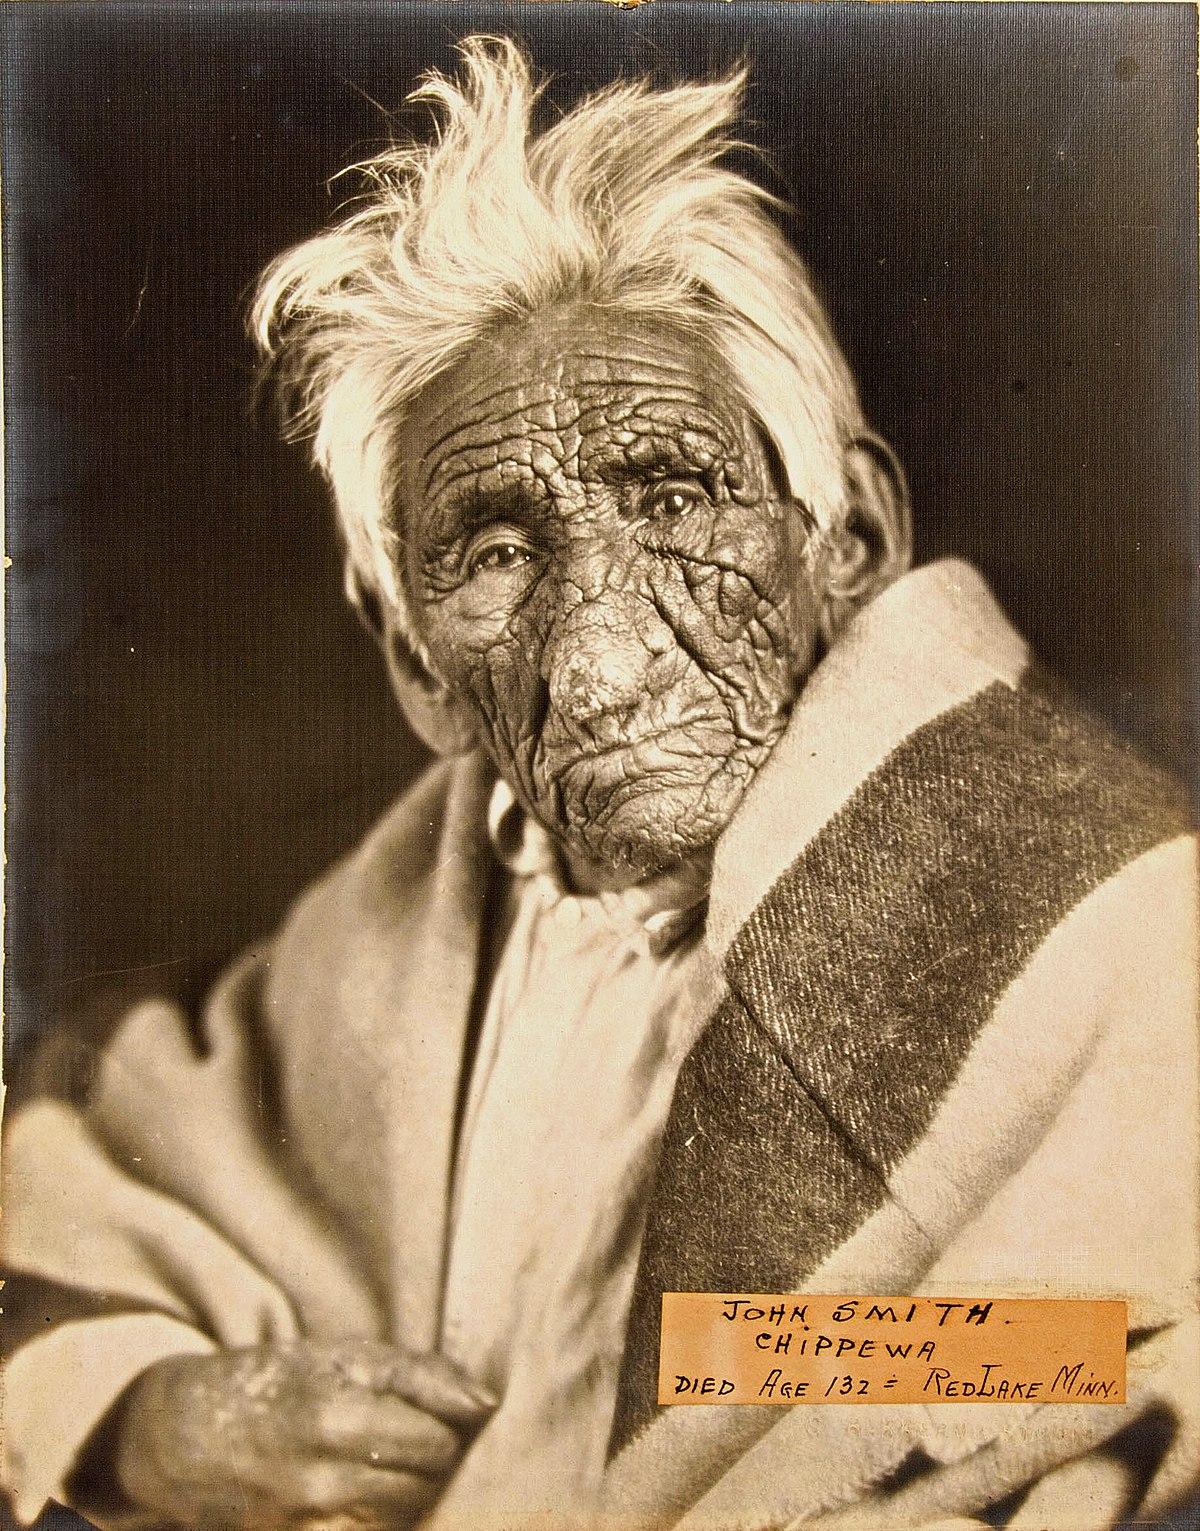 John-Smith-Chippewa-Indian-c1900-1915.jpg